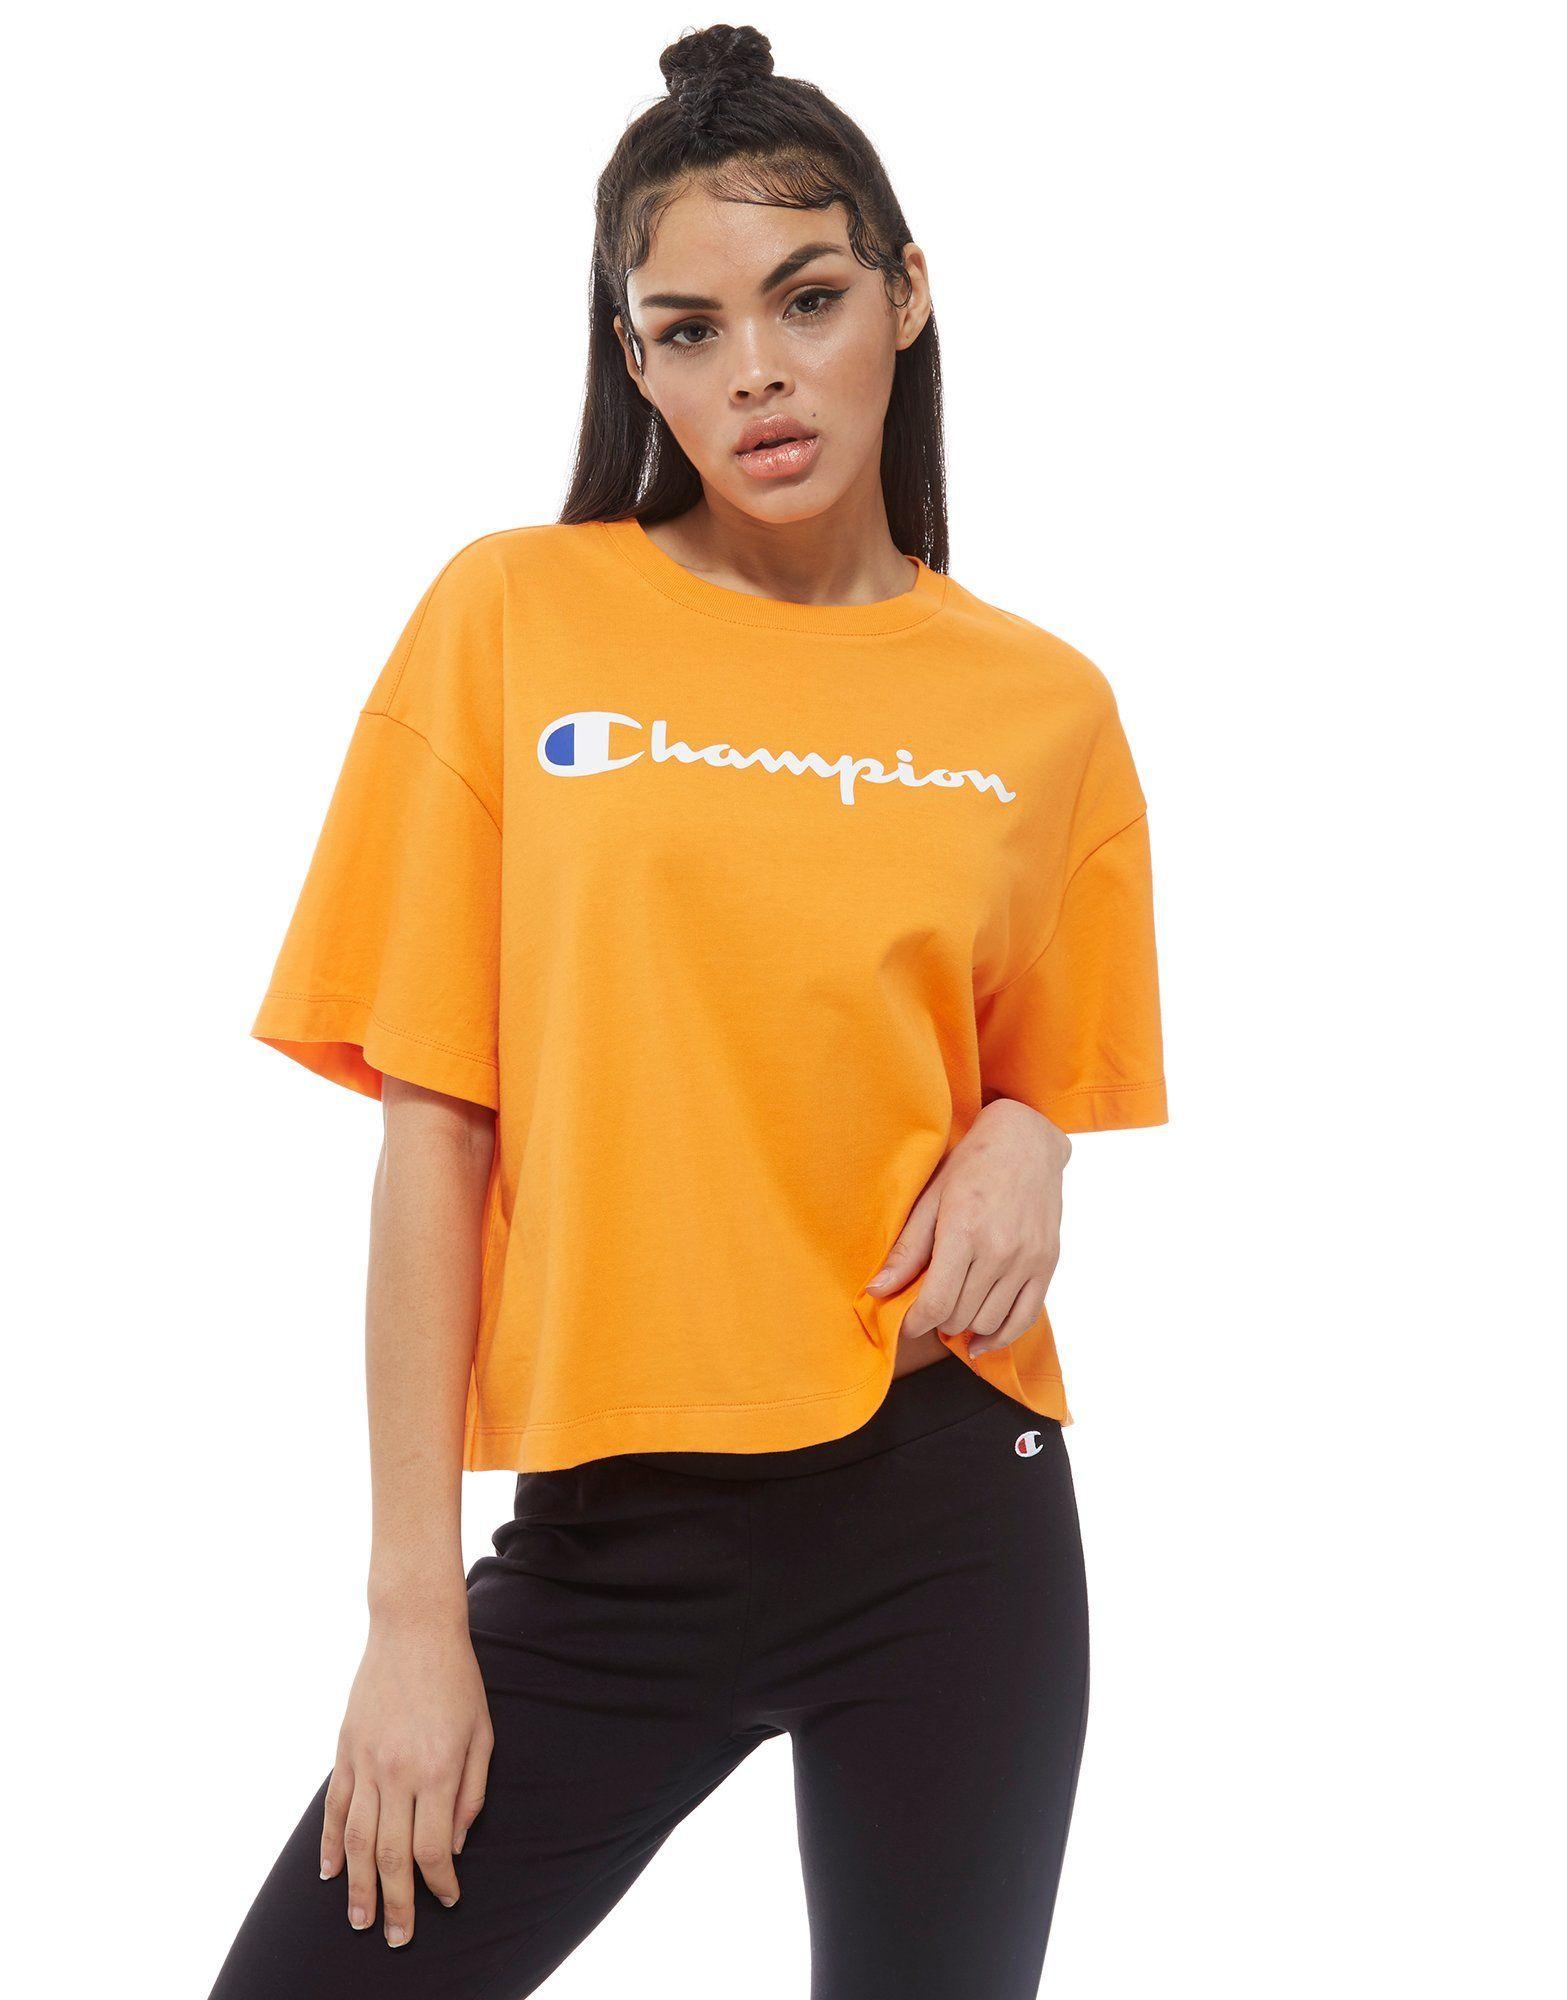 196b70050bfe89 Champion Script Boxy T-Shirt - Shoppa Champion Script Boxy T-Shirt online  hos JD Sports, Storbritanniens ledande sportmodebutik.